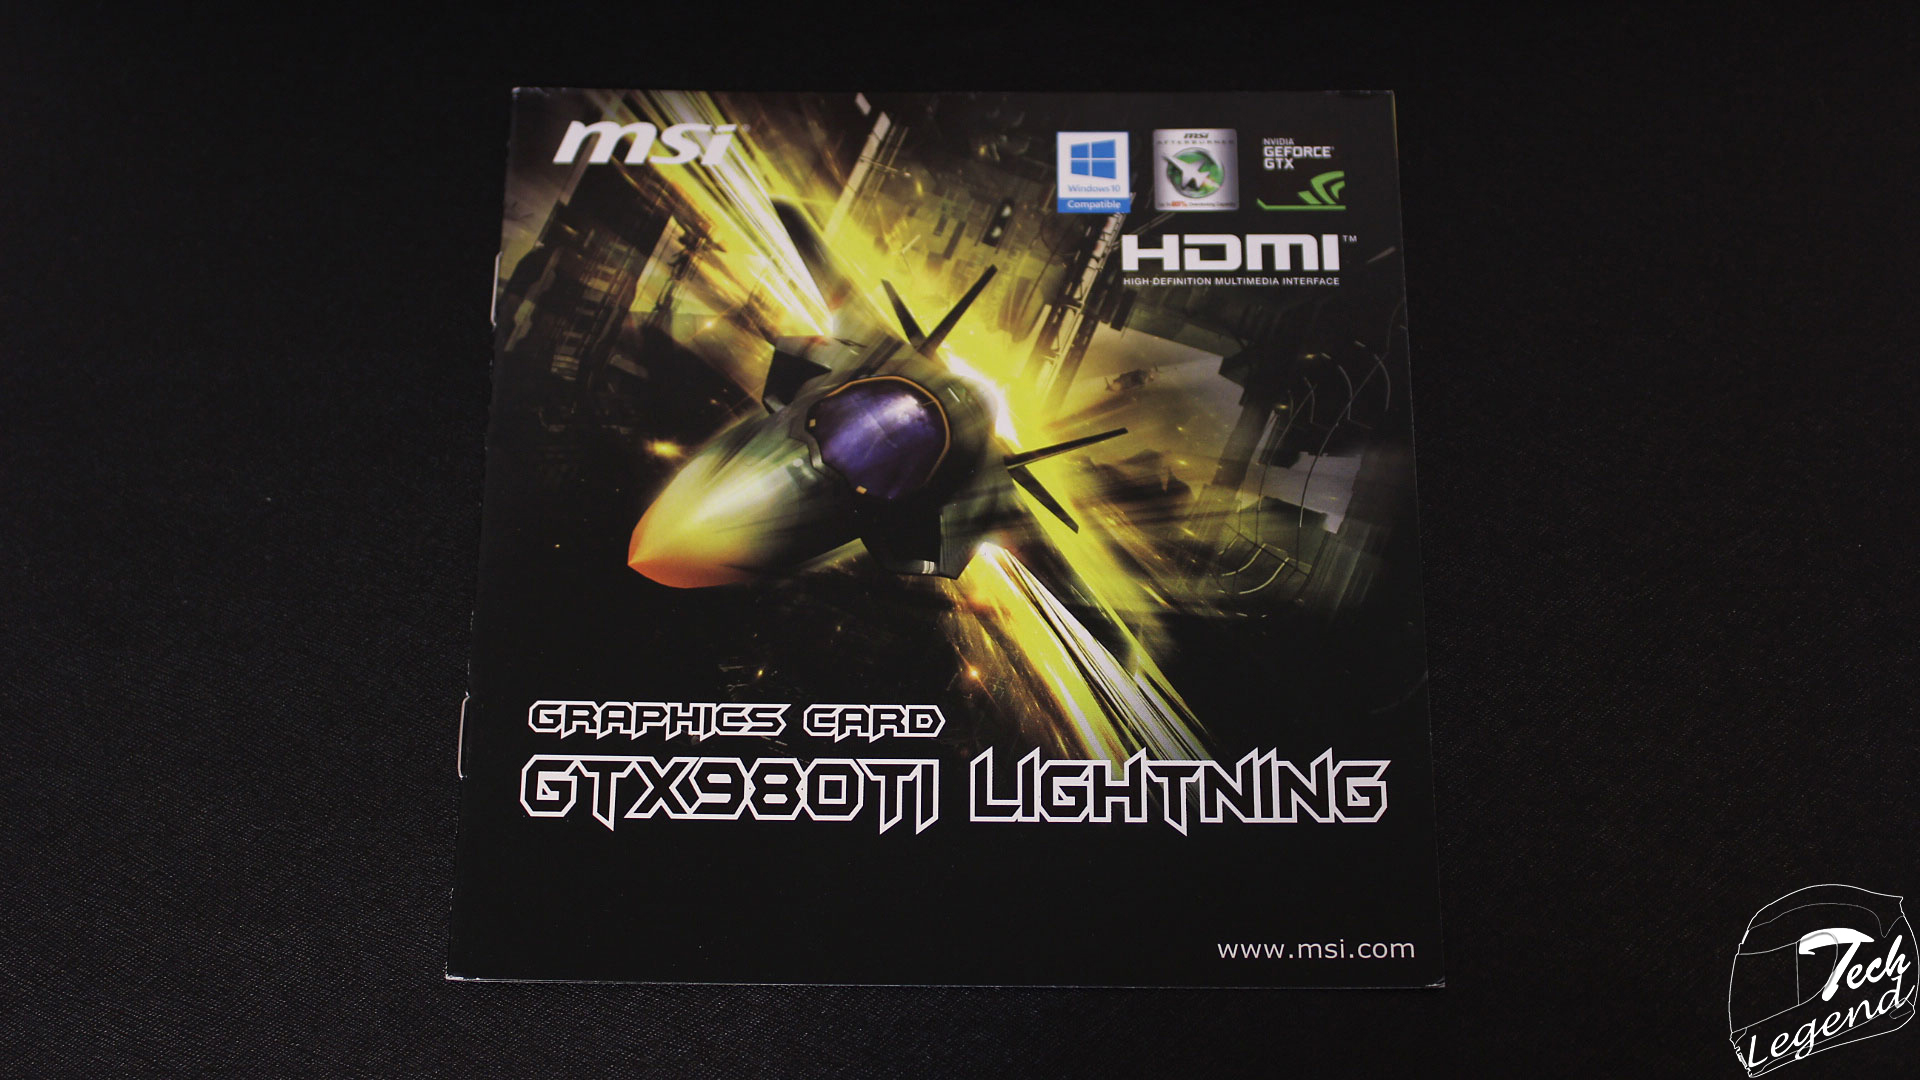 gtx 980 ti lightning drivers